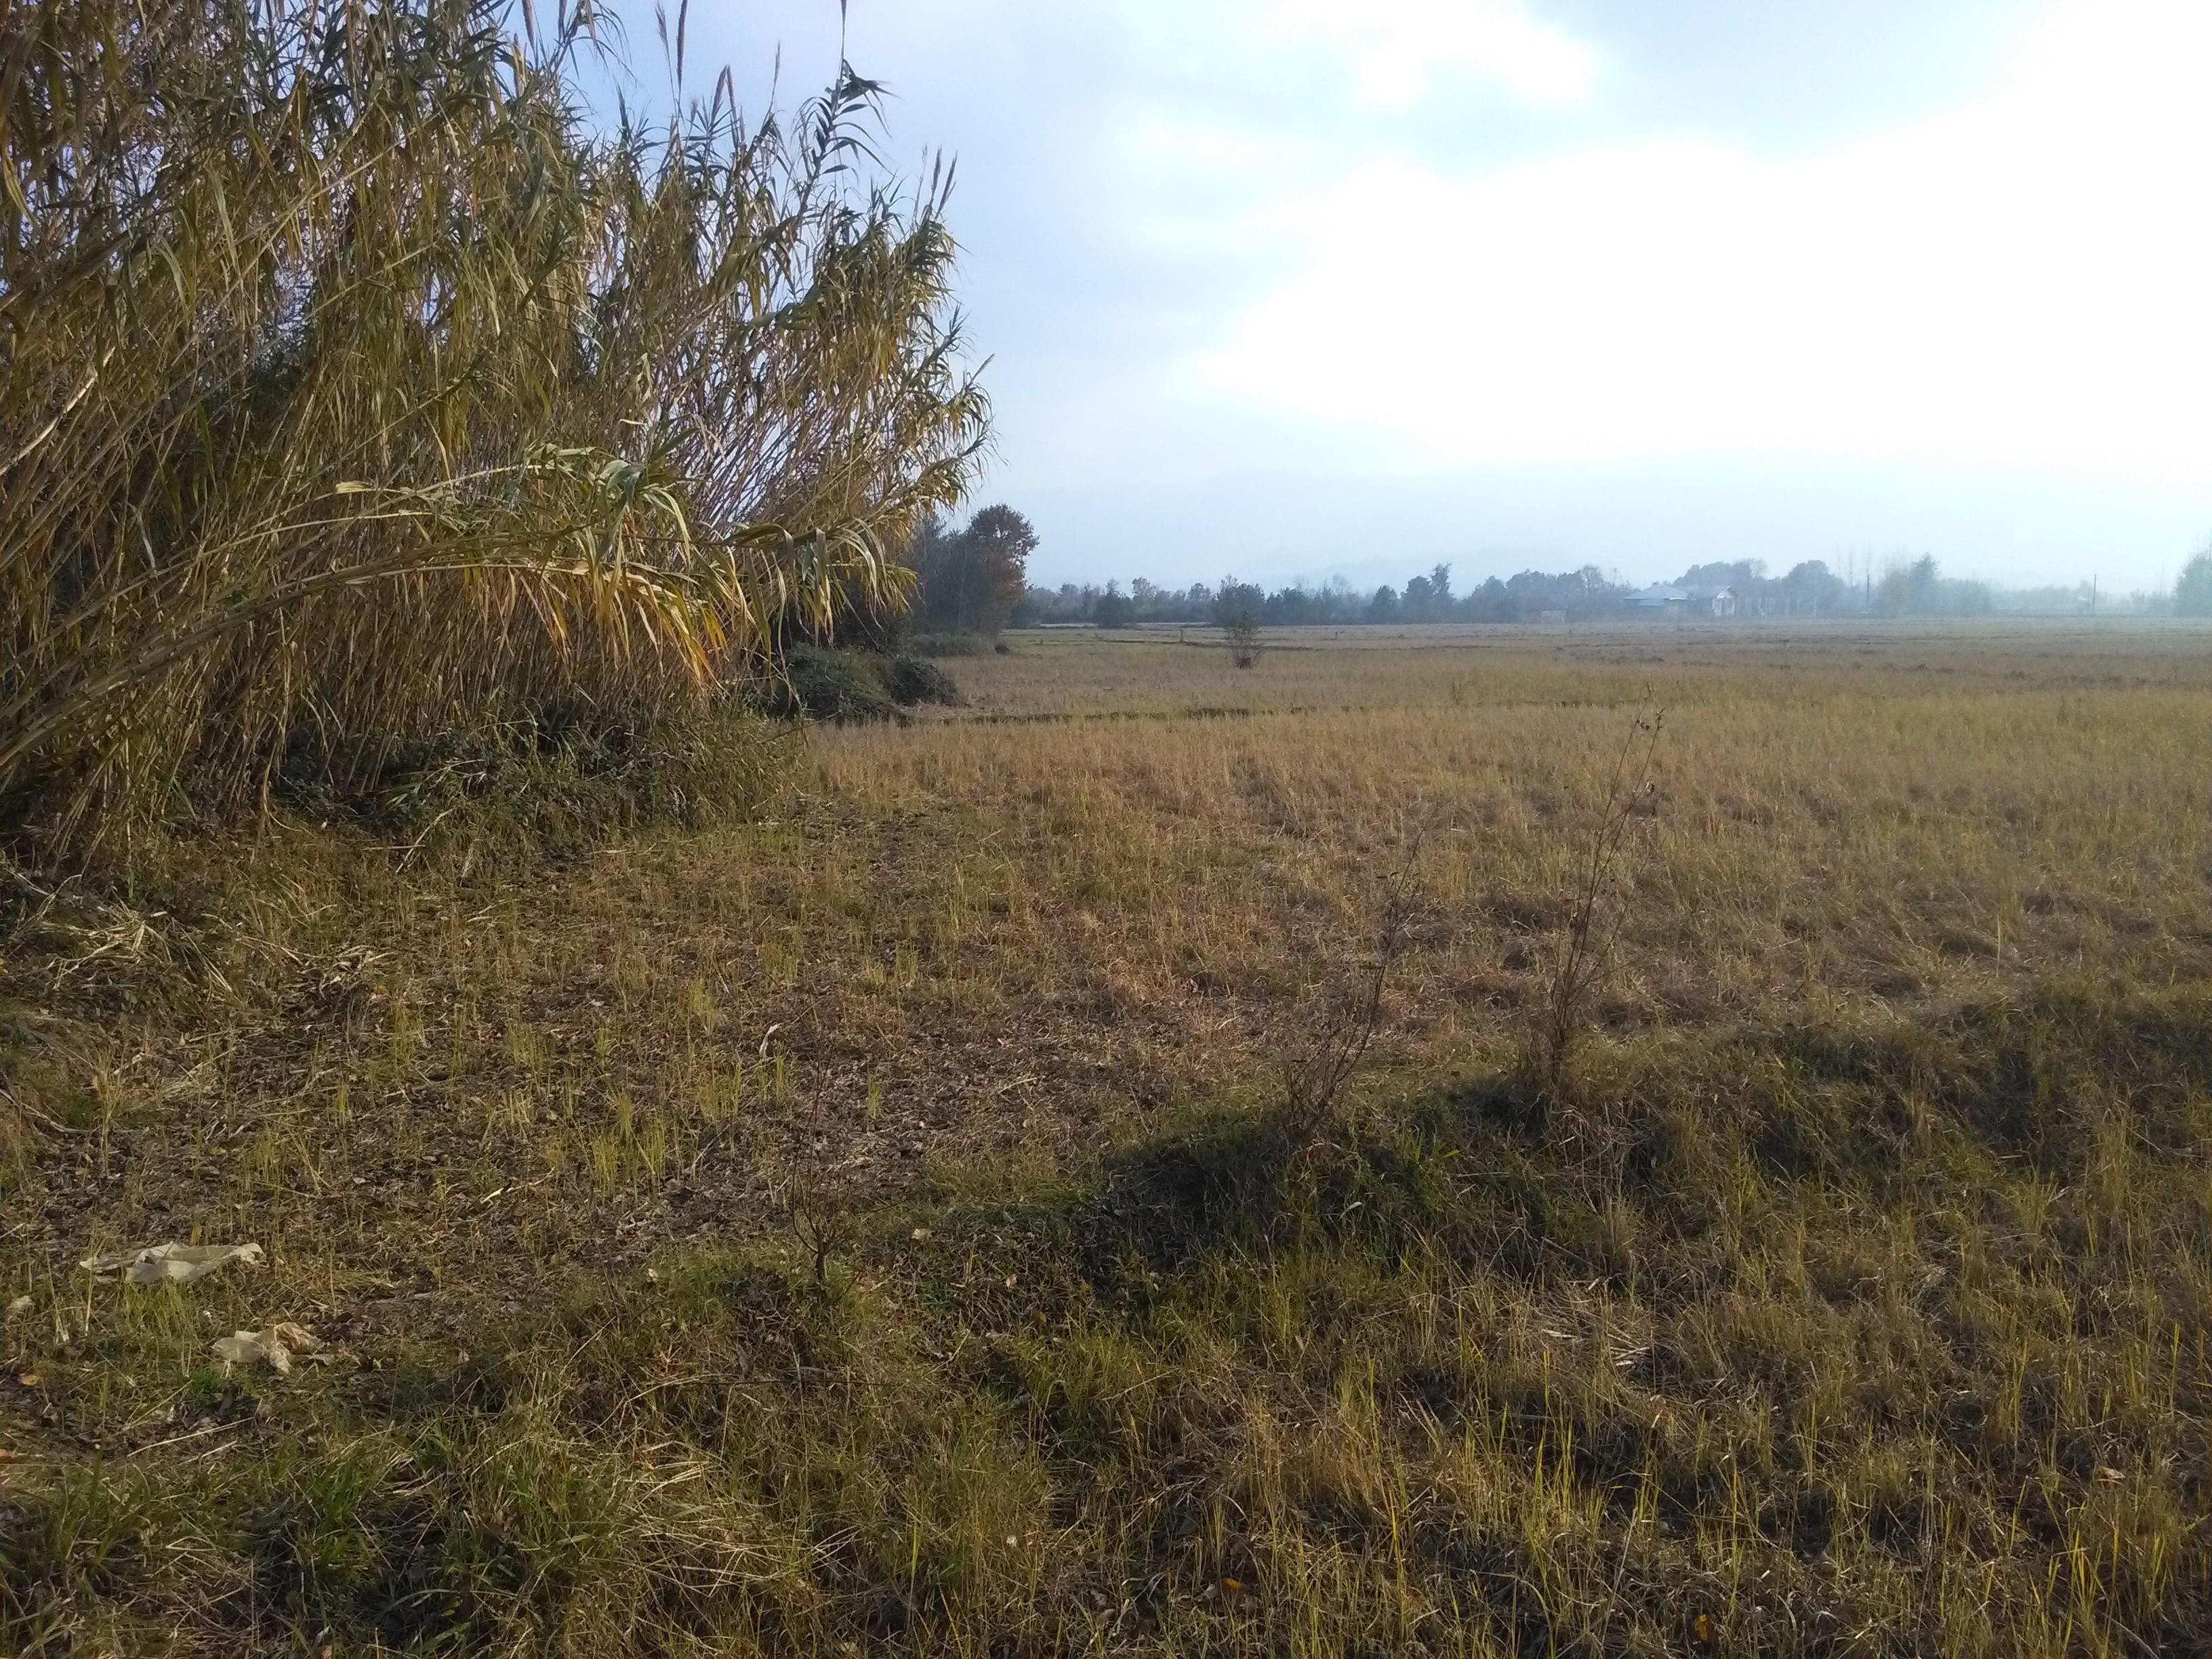 فروش زمین شالی کاری درمنطقه سیاهکل